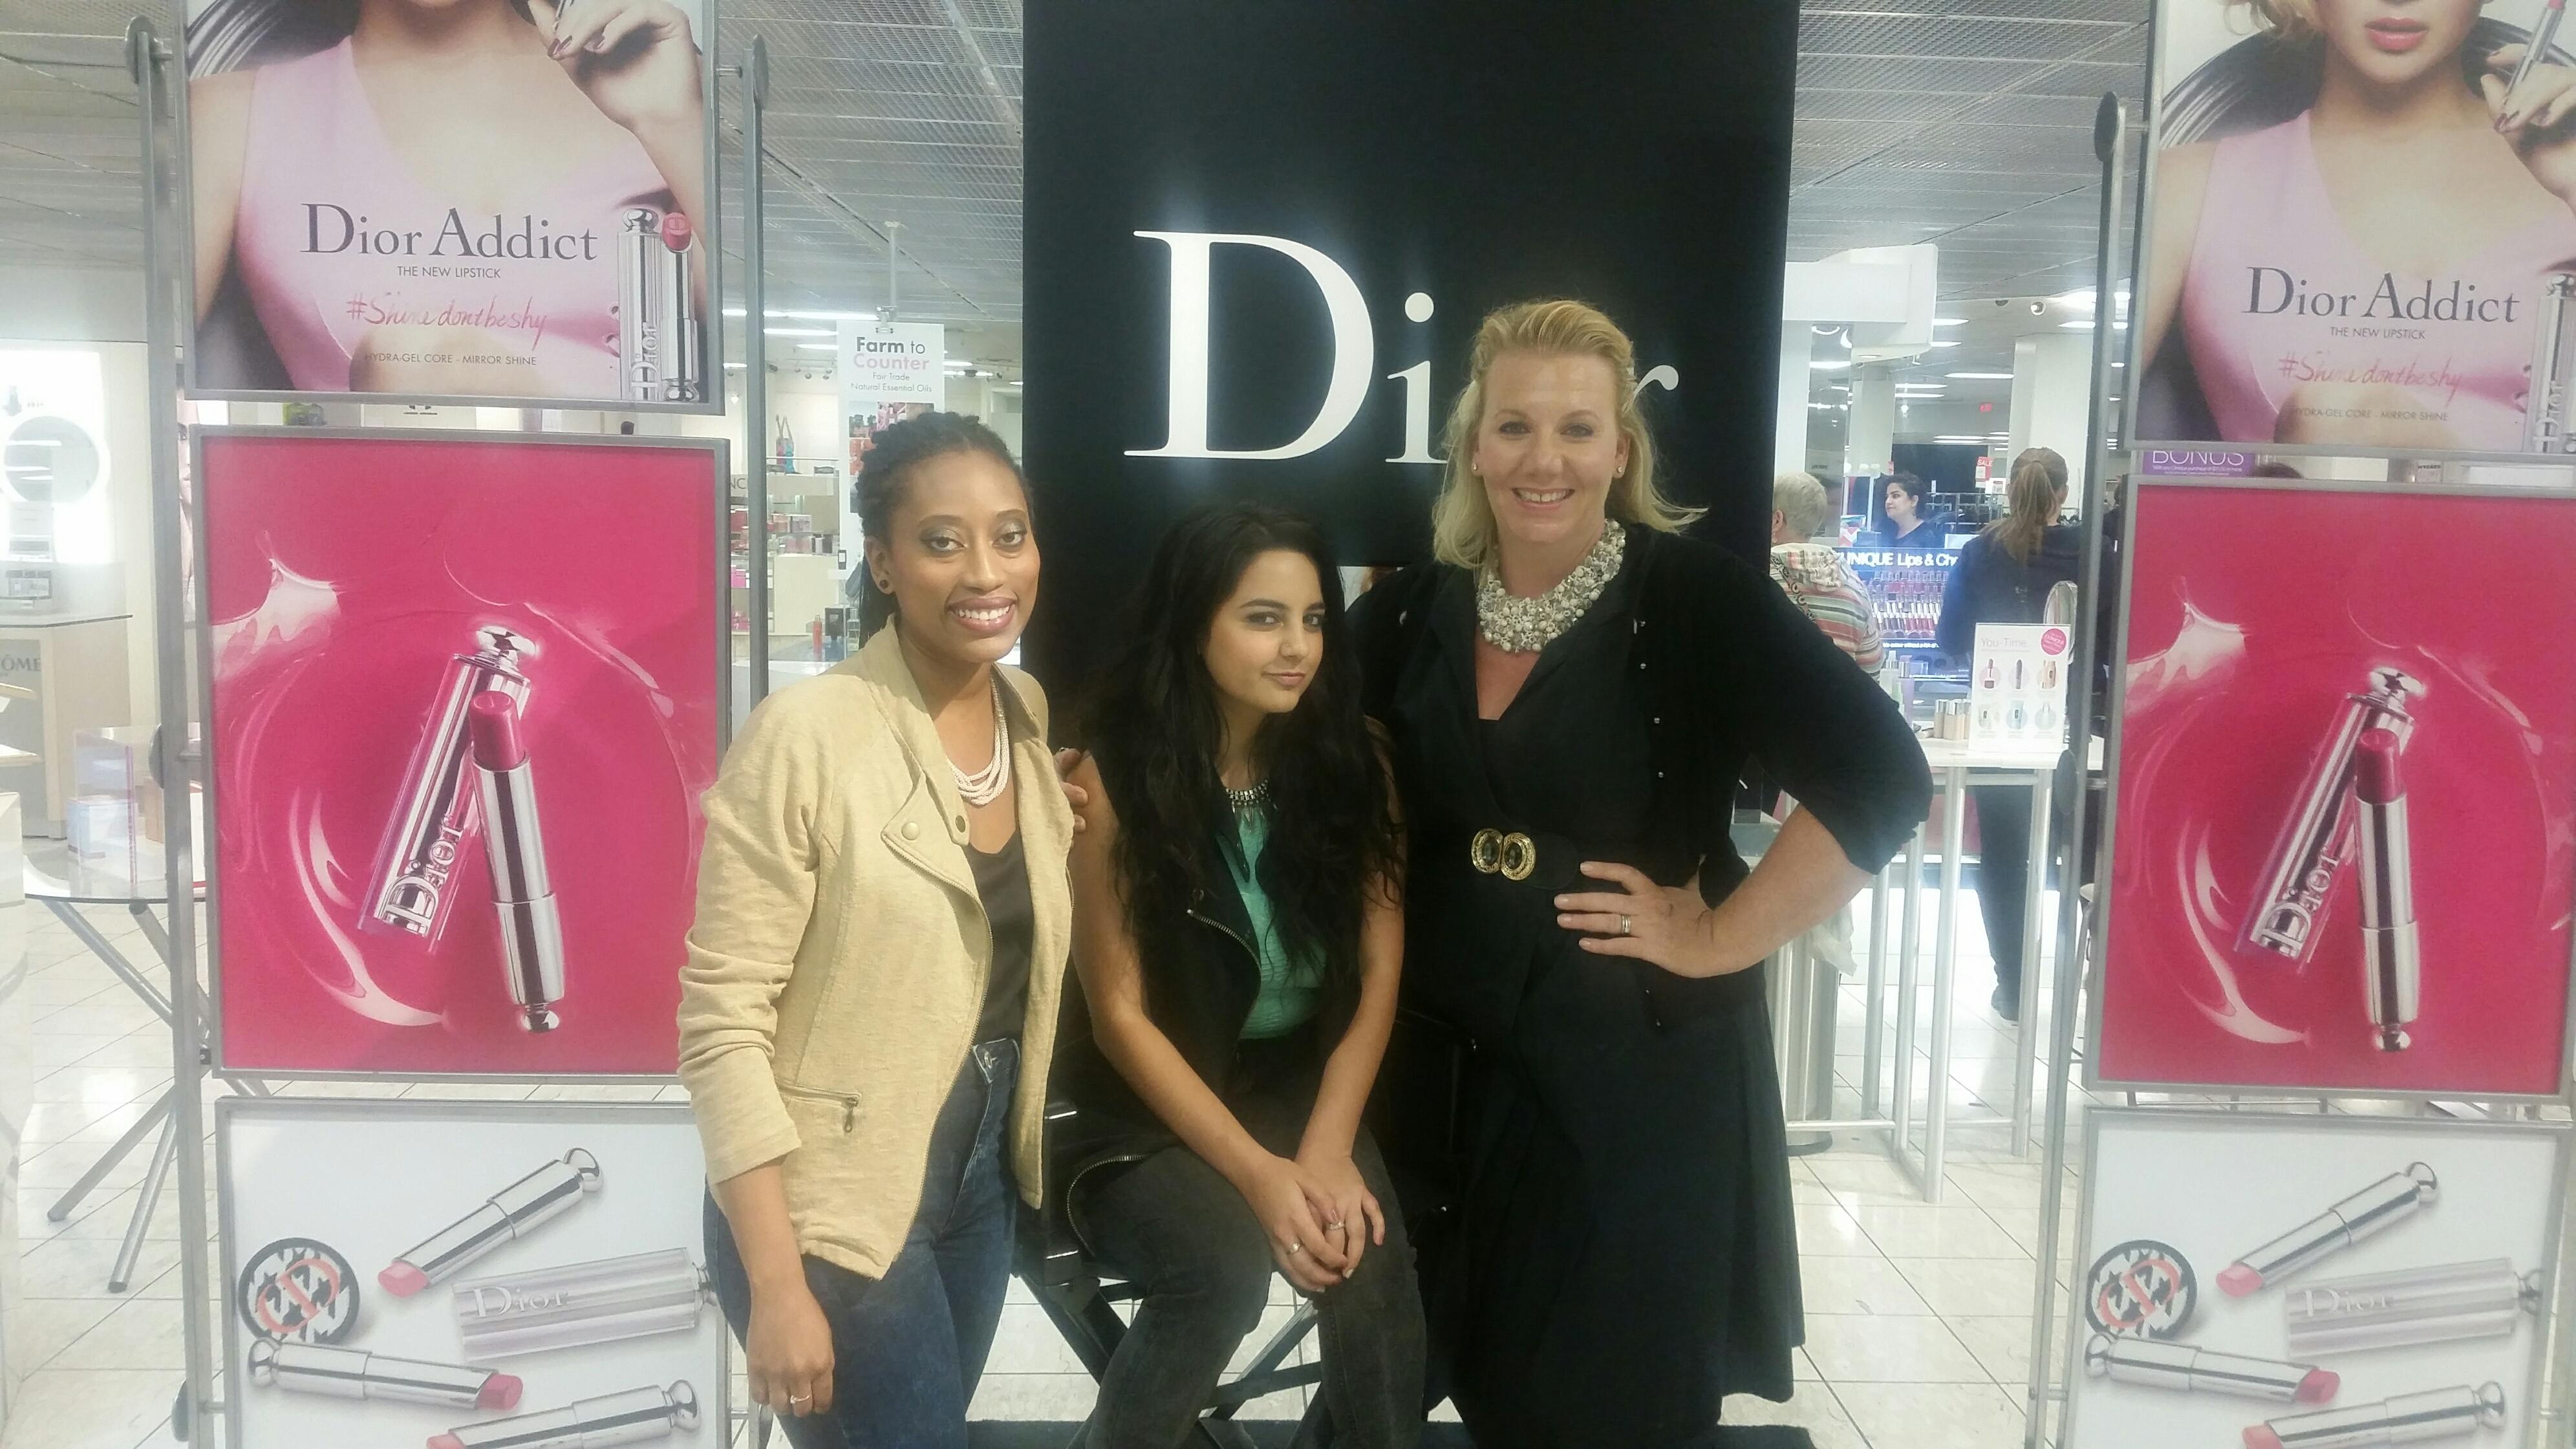 Some Dior lovelies